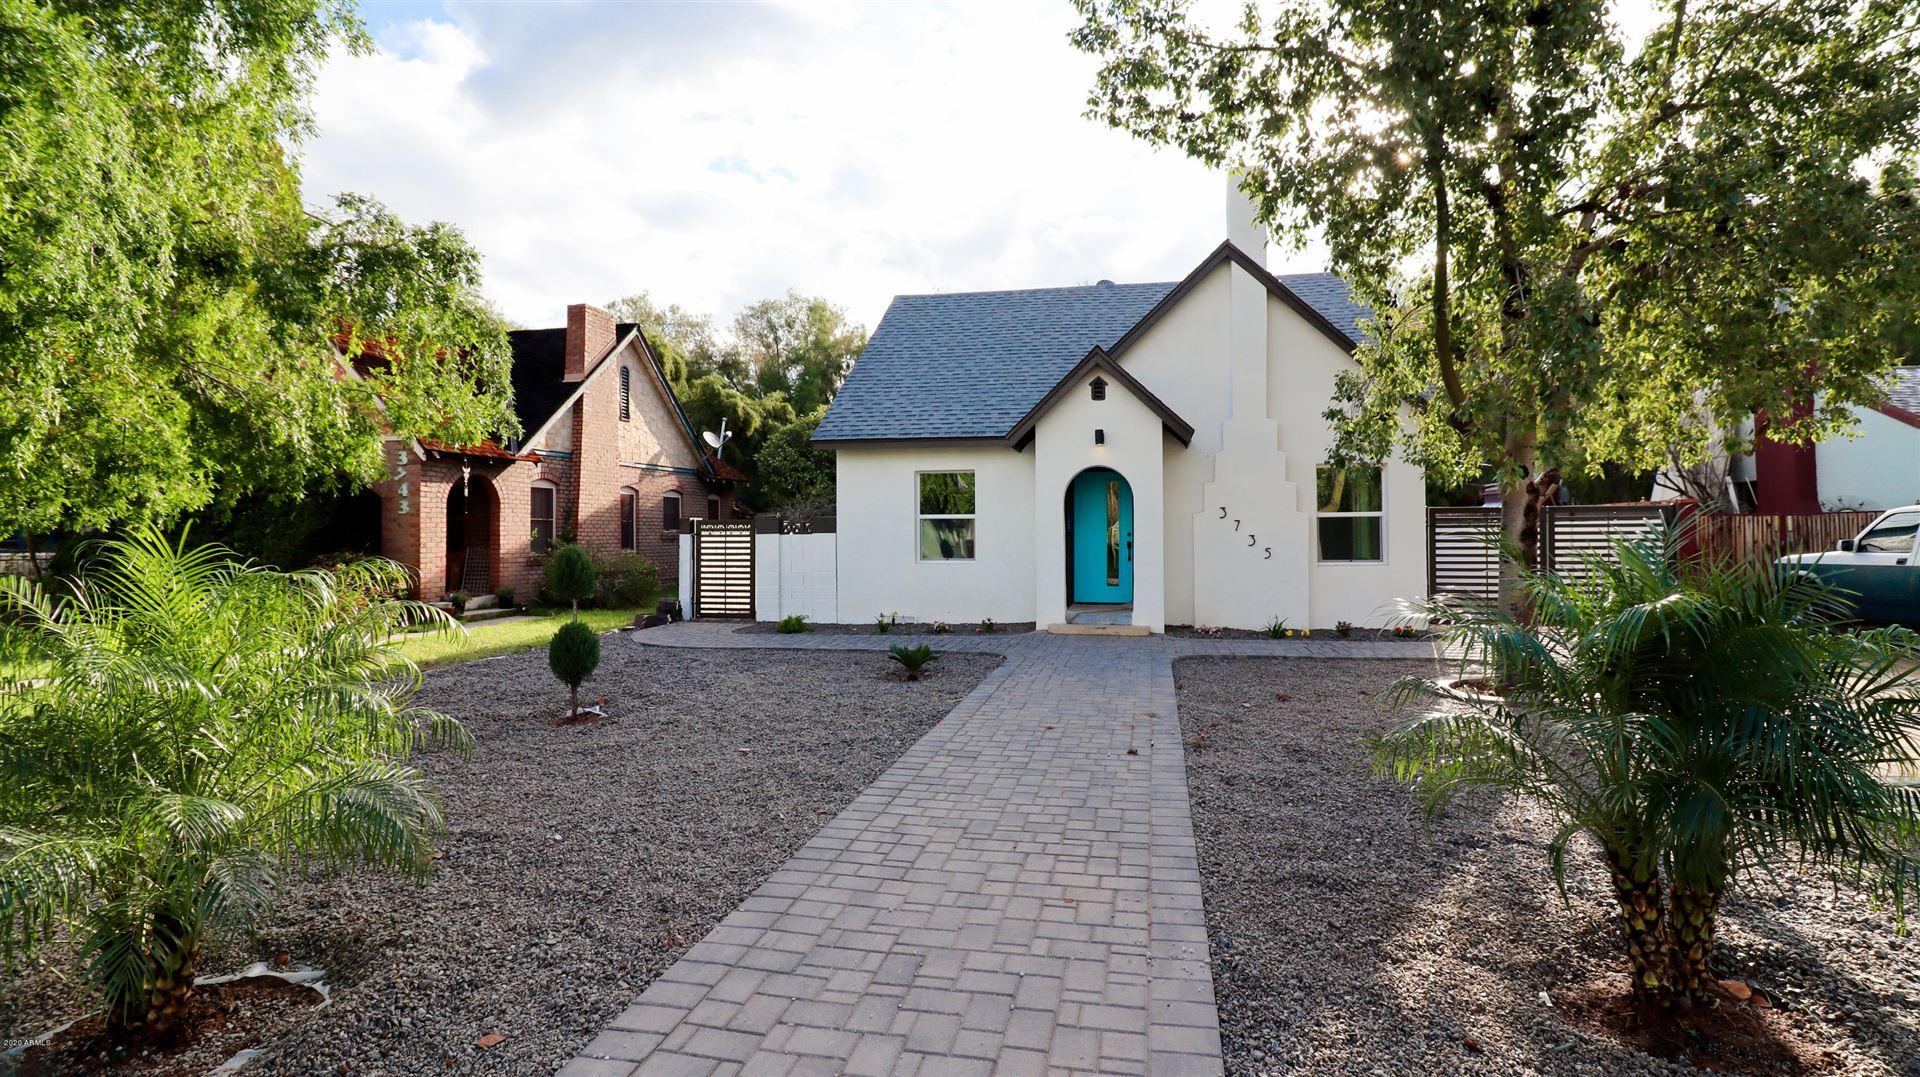 Property Image Of 3735 N 11Th Street In Phoenix, Az